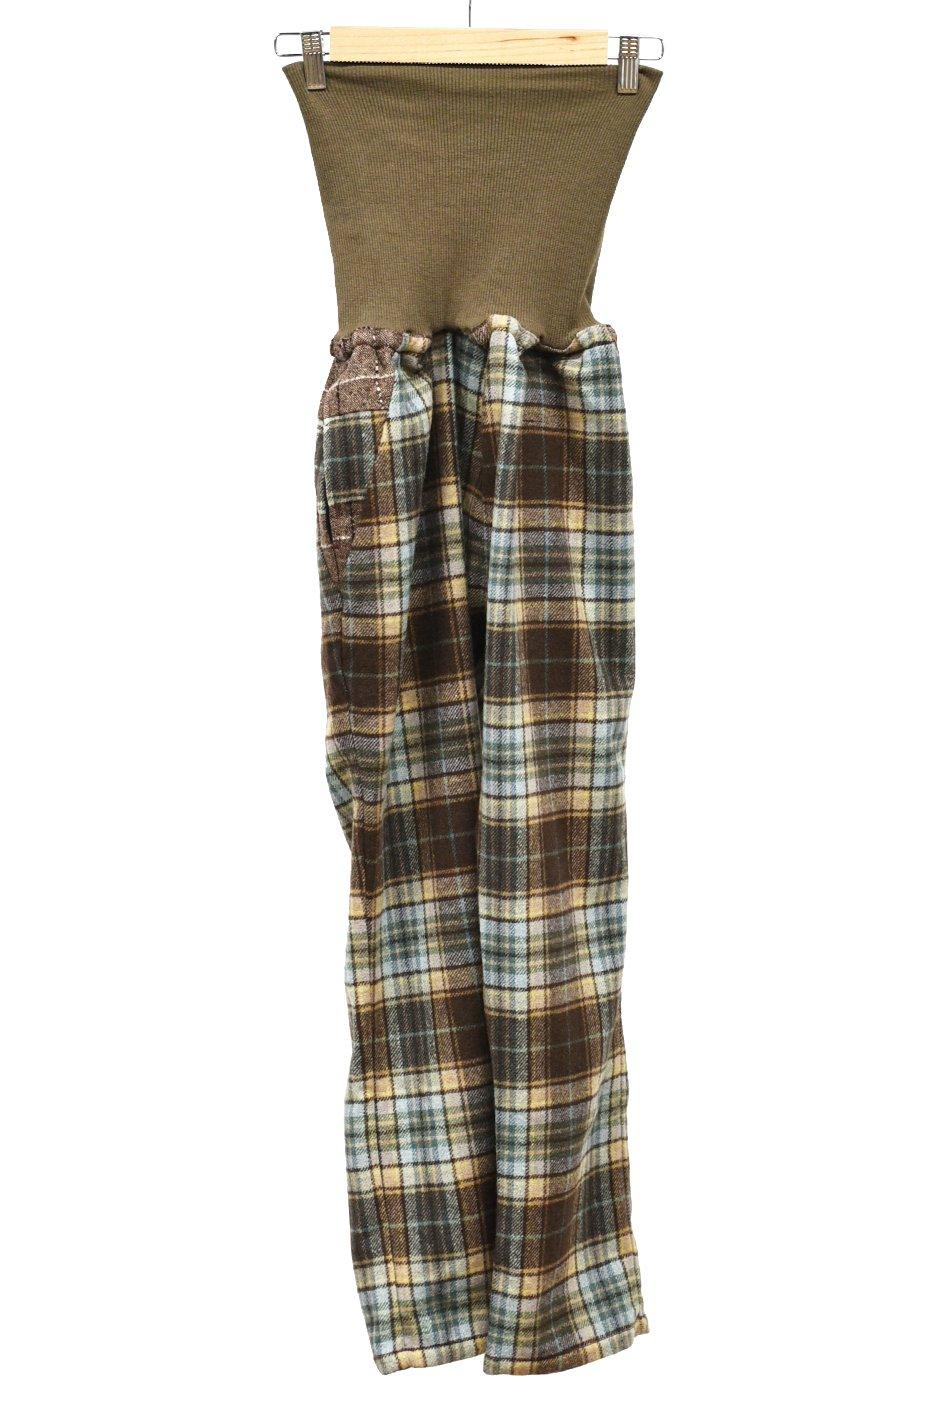 BURNOUT × ARIGATO FAKKYU  HARAMAKI Pants / Green Check